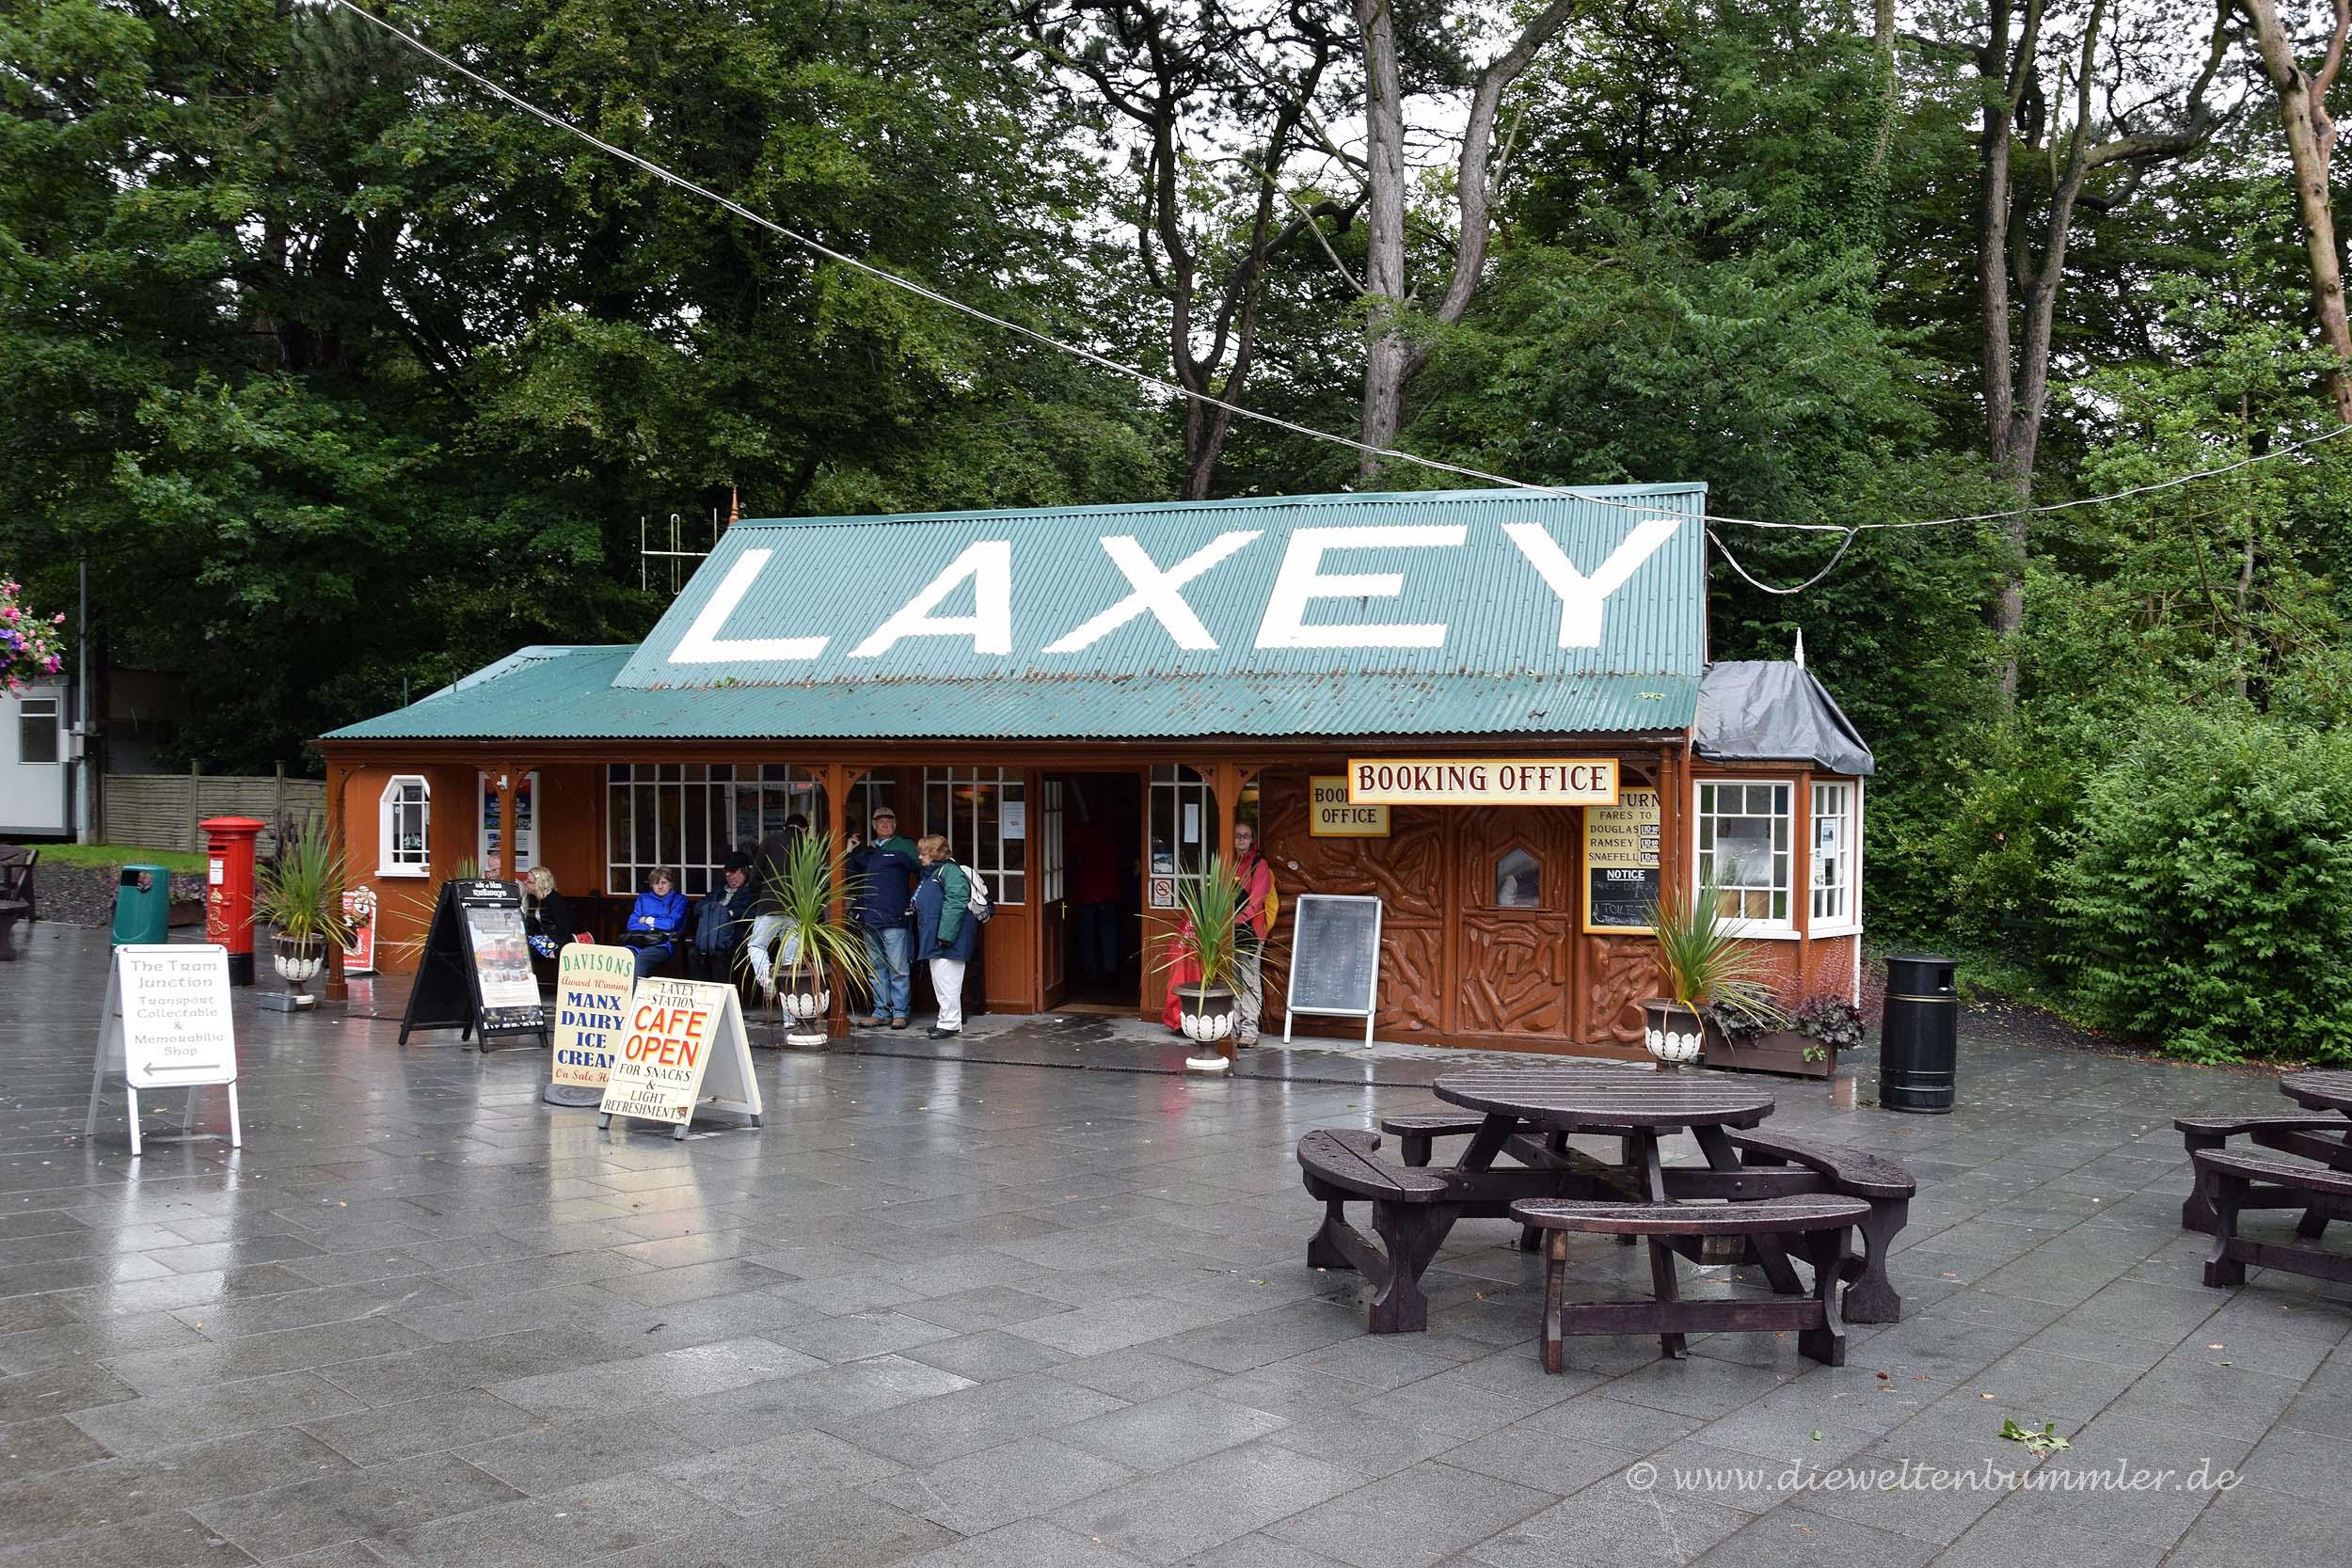 Bahnhof in Laxey